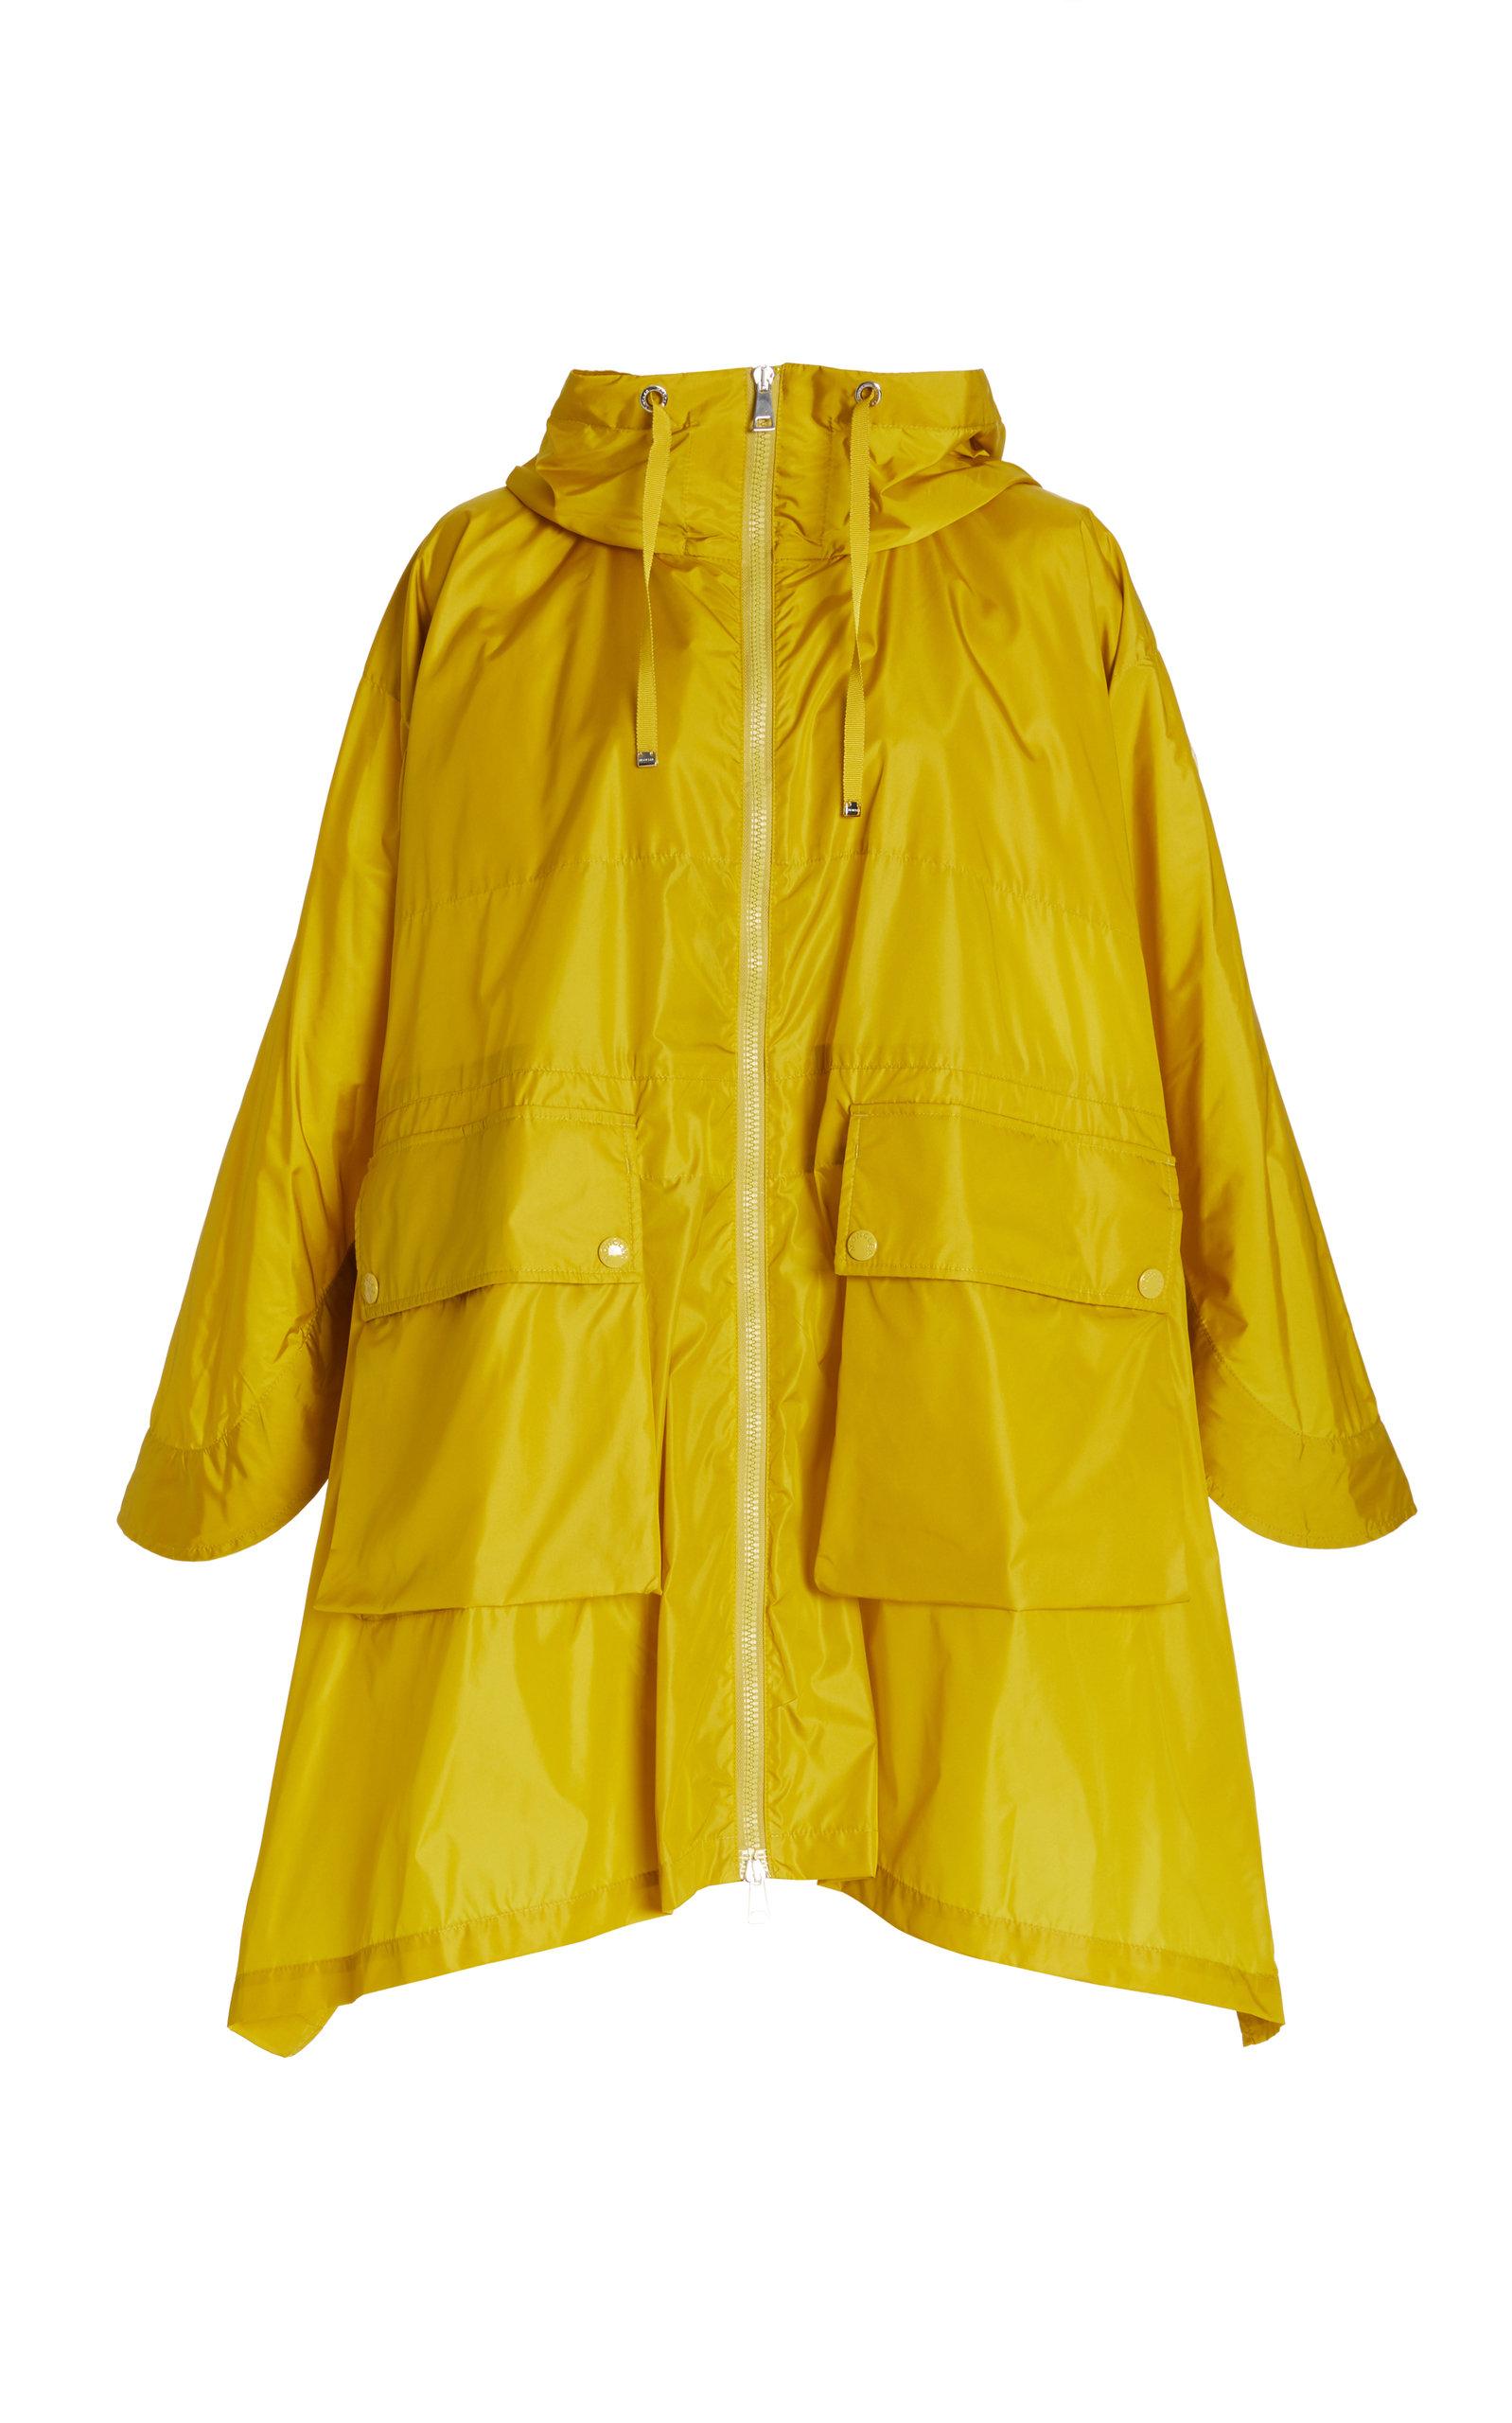 Moncler - Women's Printseps Oversized Shell Rain Jacket - Yellow - Moda Operandi